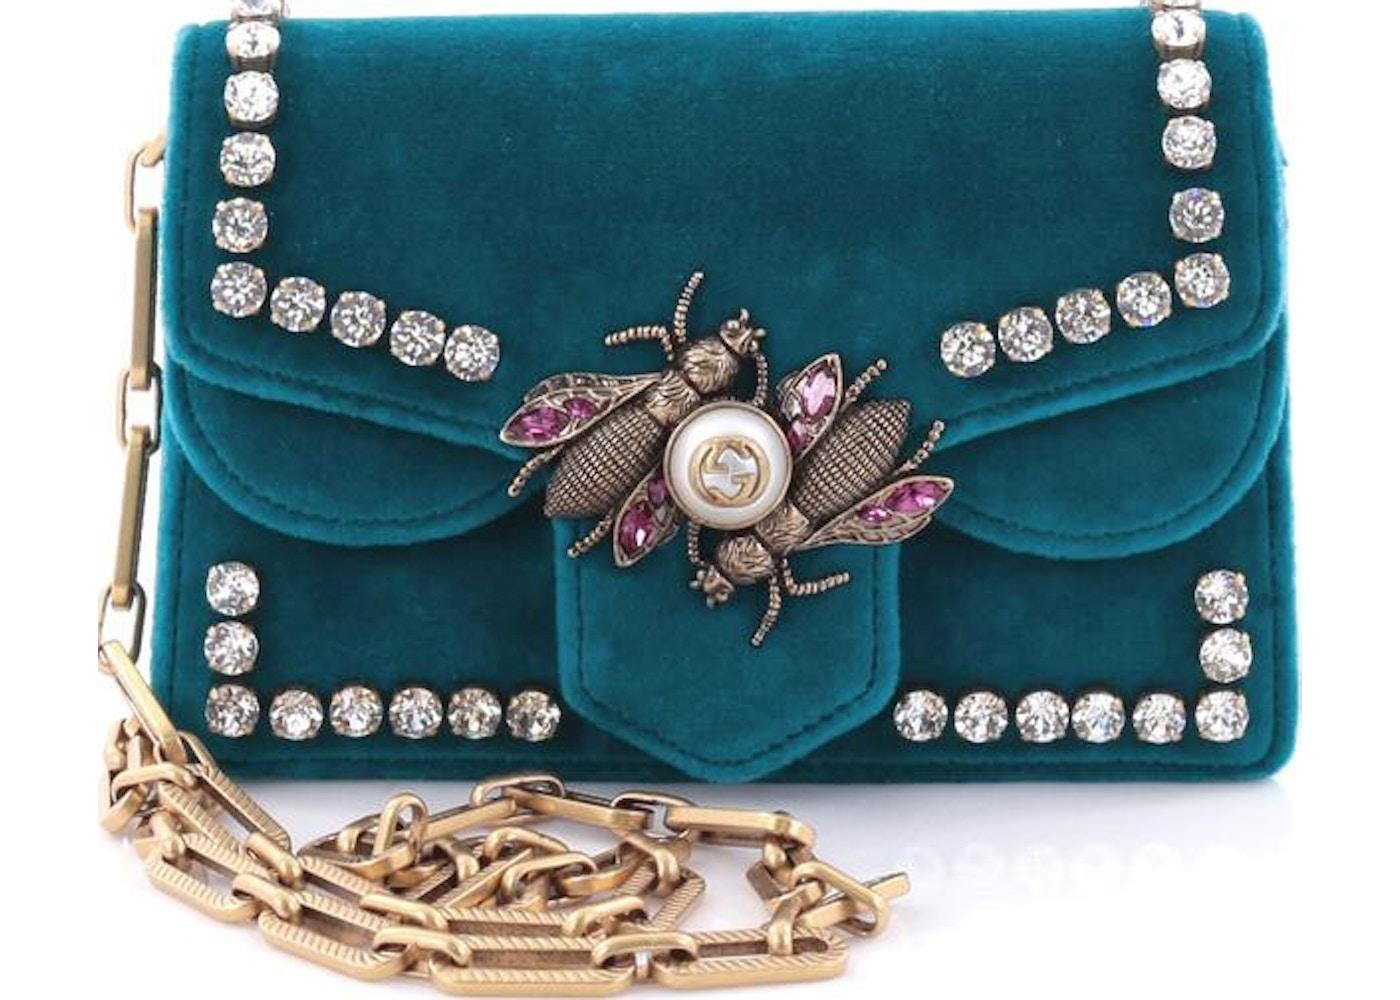 870545924a02 Gucci Broadway Shoulder Bag Pearly Bee Mini Teal. Pearly Bee Mini Teal